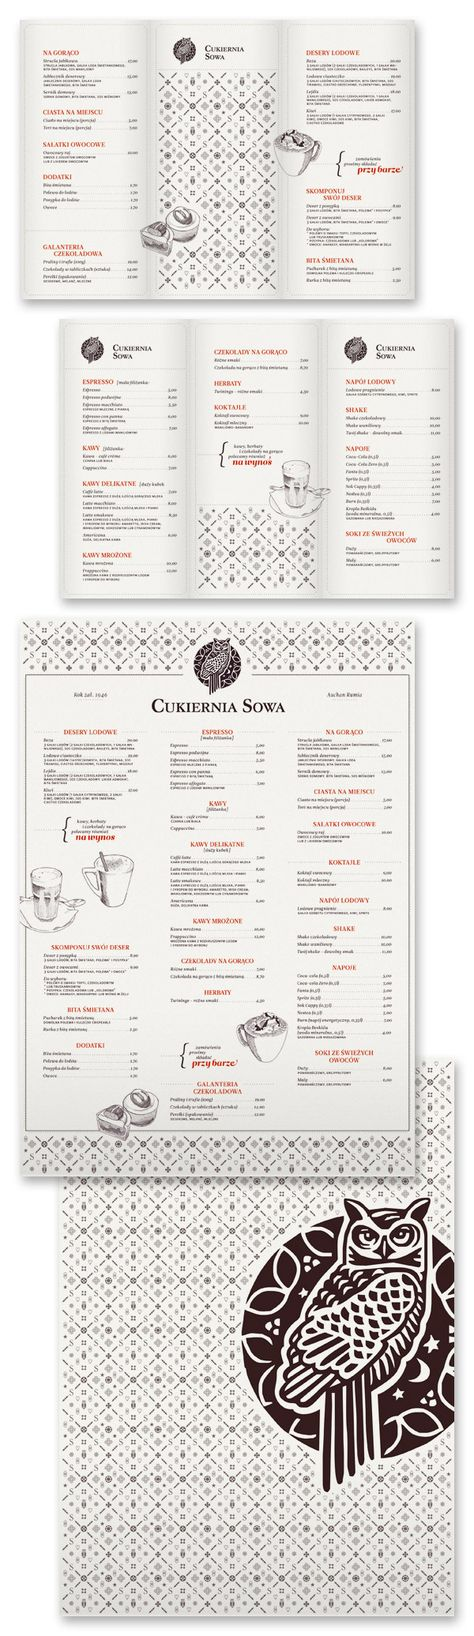 cafe-restaurant-menu-design-food-drink-inspiration-roundup-025 - restaurant survey template